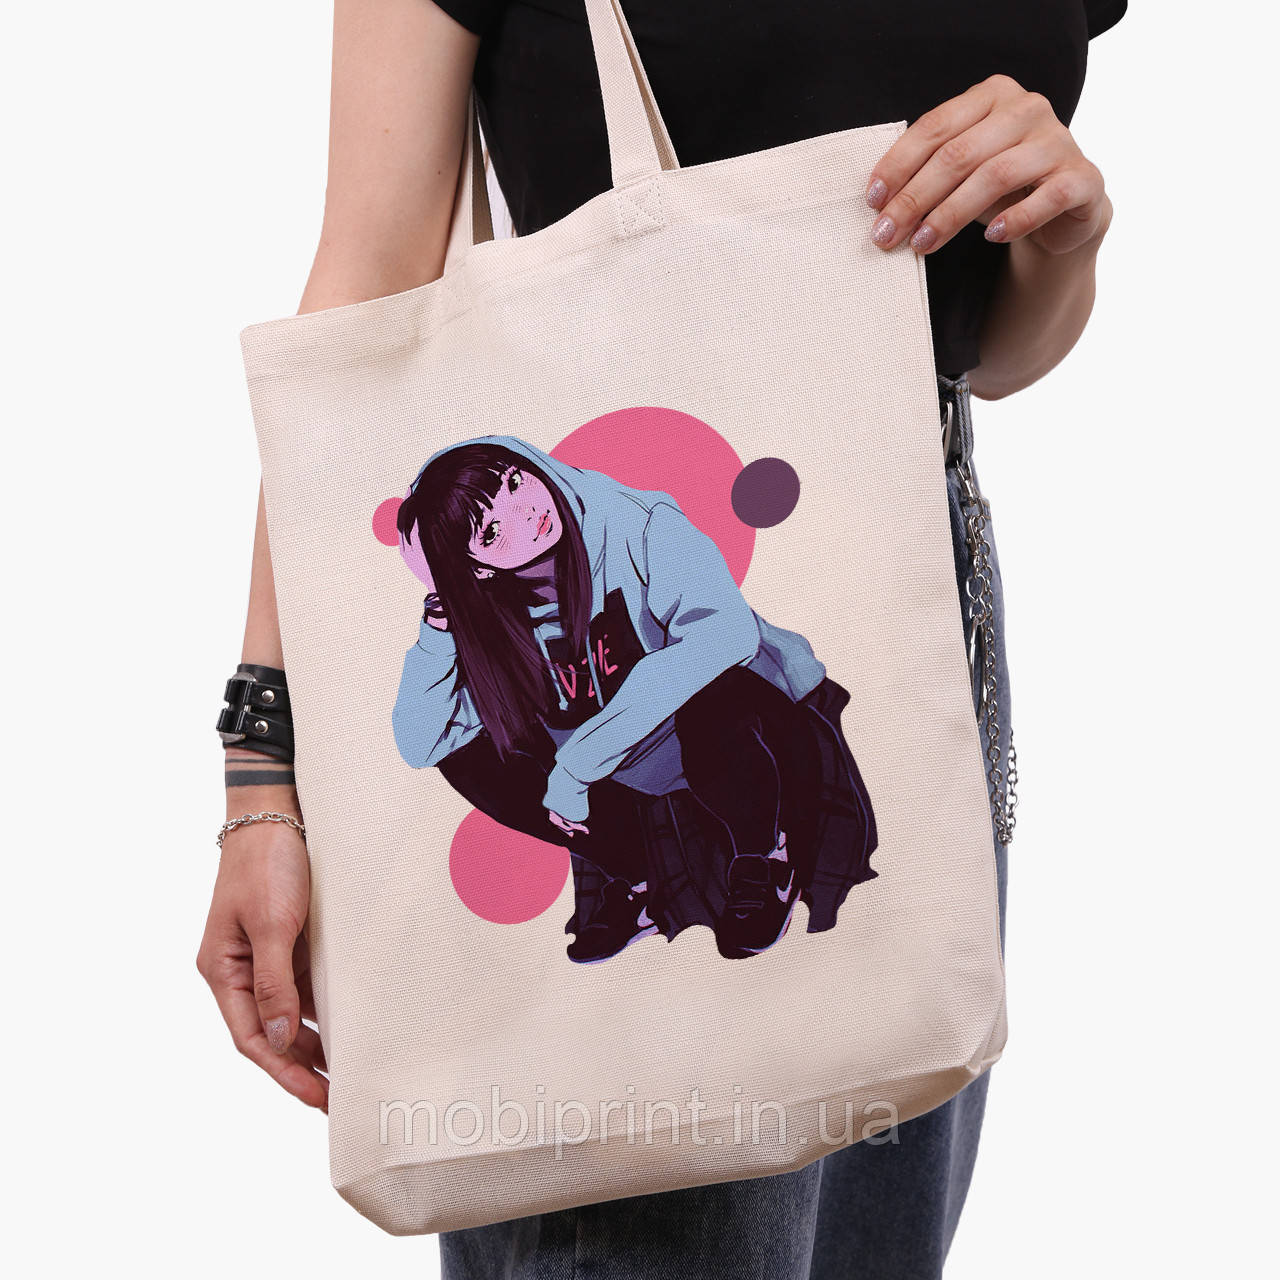 Эко сумка шоппер белая Девушка (Girl) (9227-2836-1)  41*39*8 см